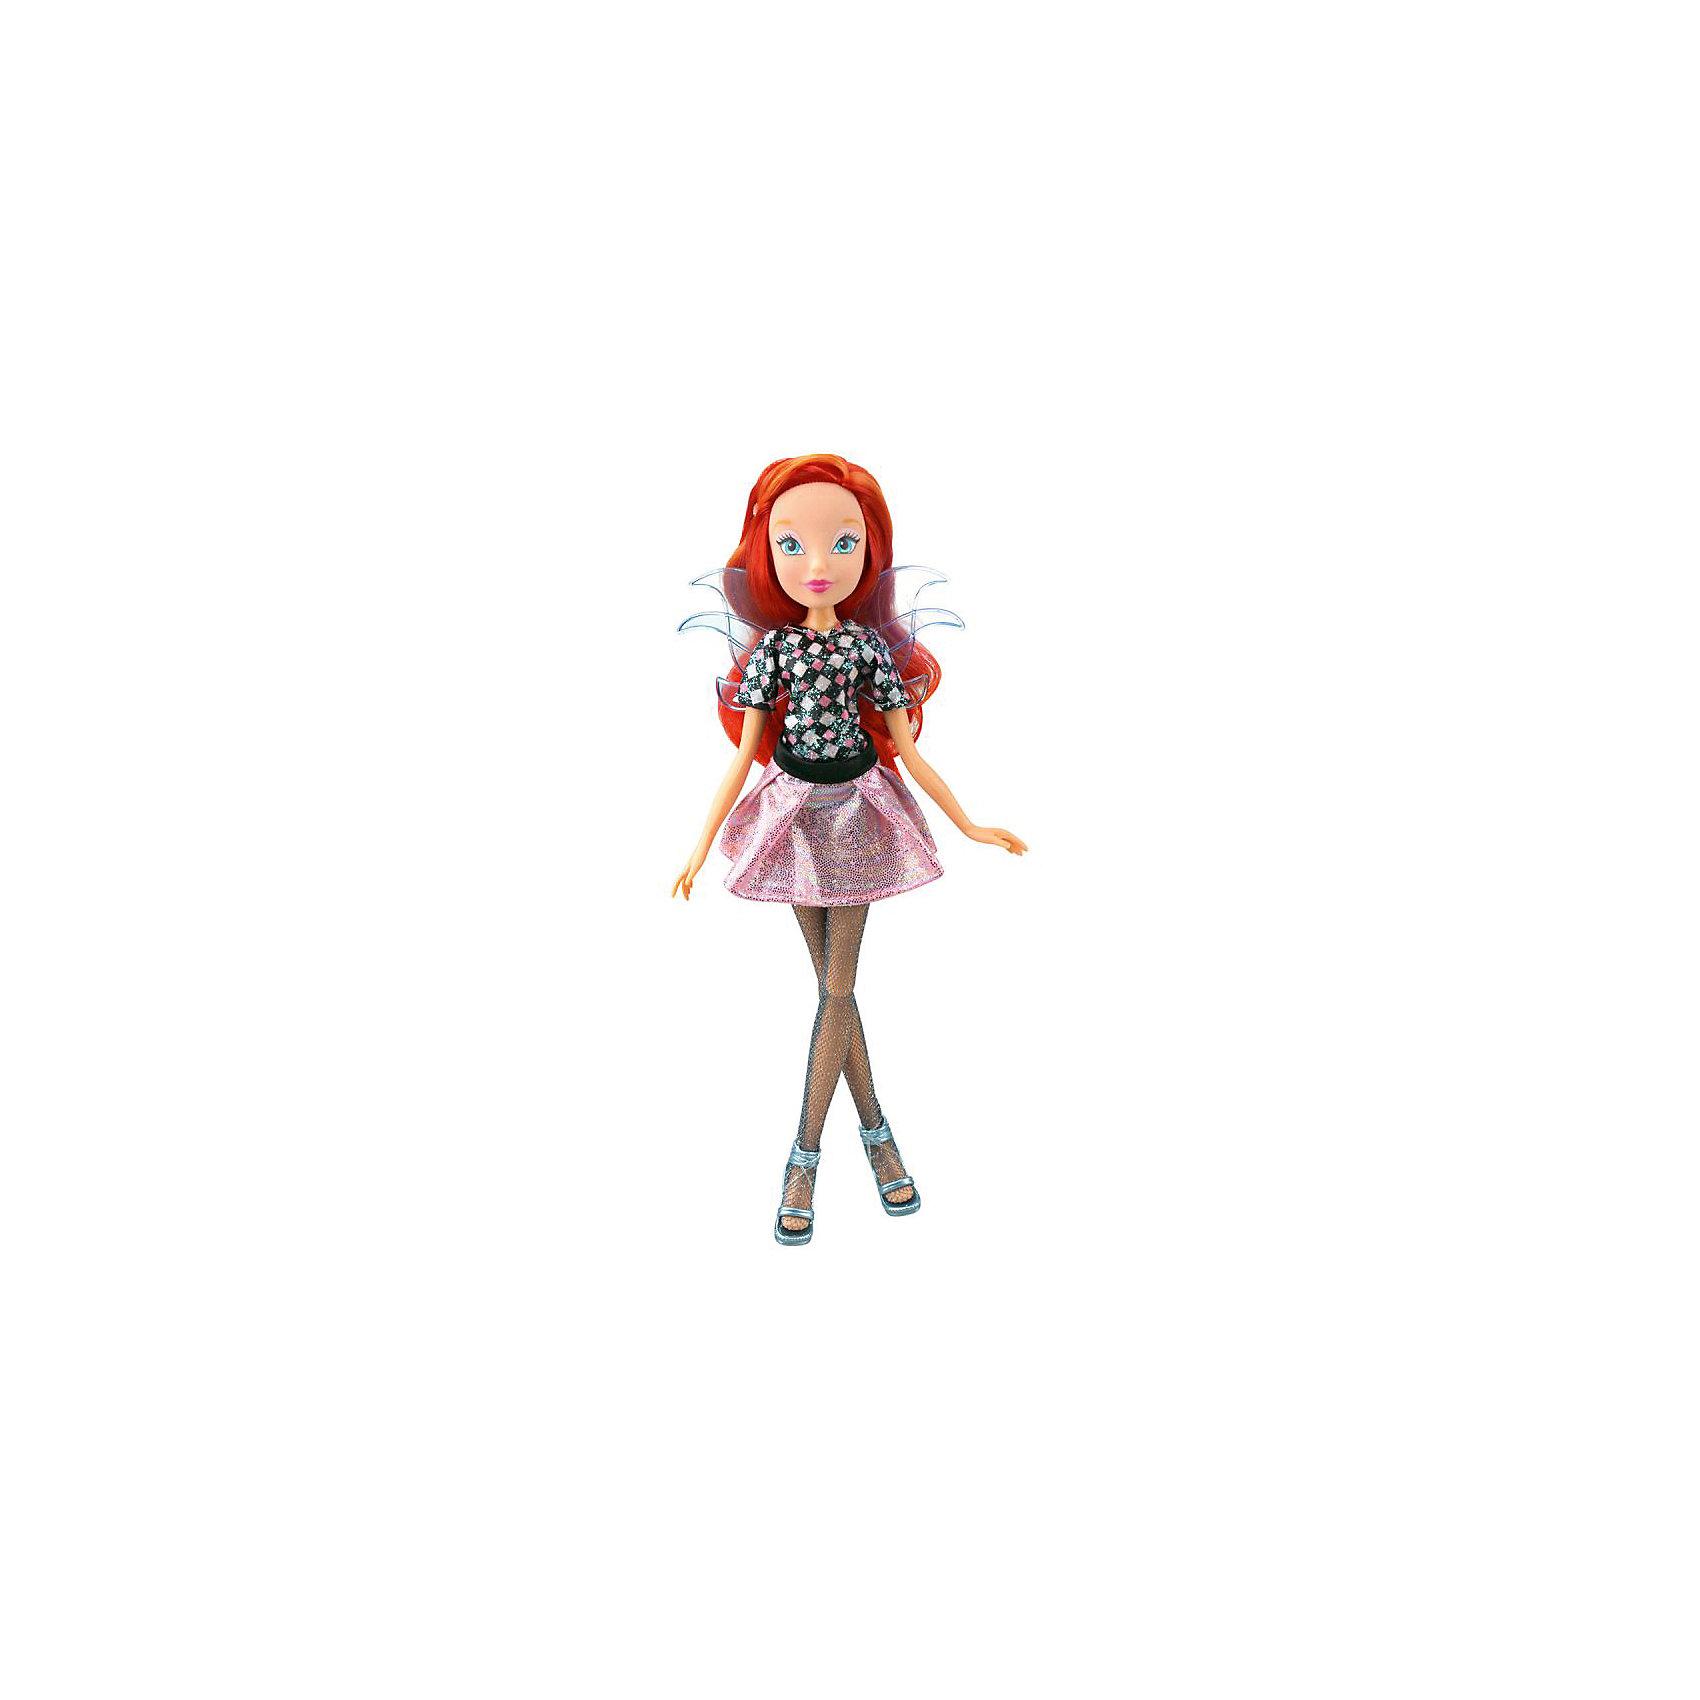 Кукла Winx Club WOW Лофт Блум, 35 смКуклы-модели<br><br><br>Ширина мм: 210<br>Глубина мм: 60<br>Высота мм: 350<br>Вес г: 225<br>Возраст от месяцев: 36<br>Возраст до месяцев: 120<br>Пол: Женский<br>Возраст: Детский<br>SKU: 7097674